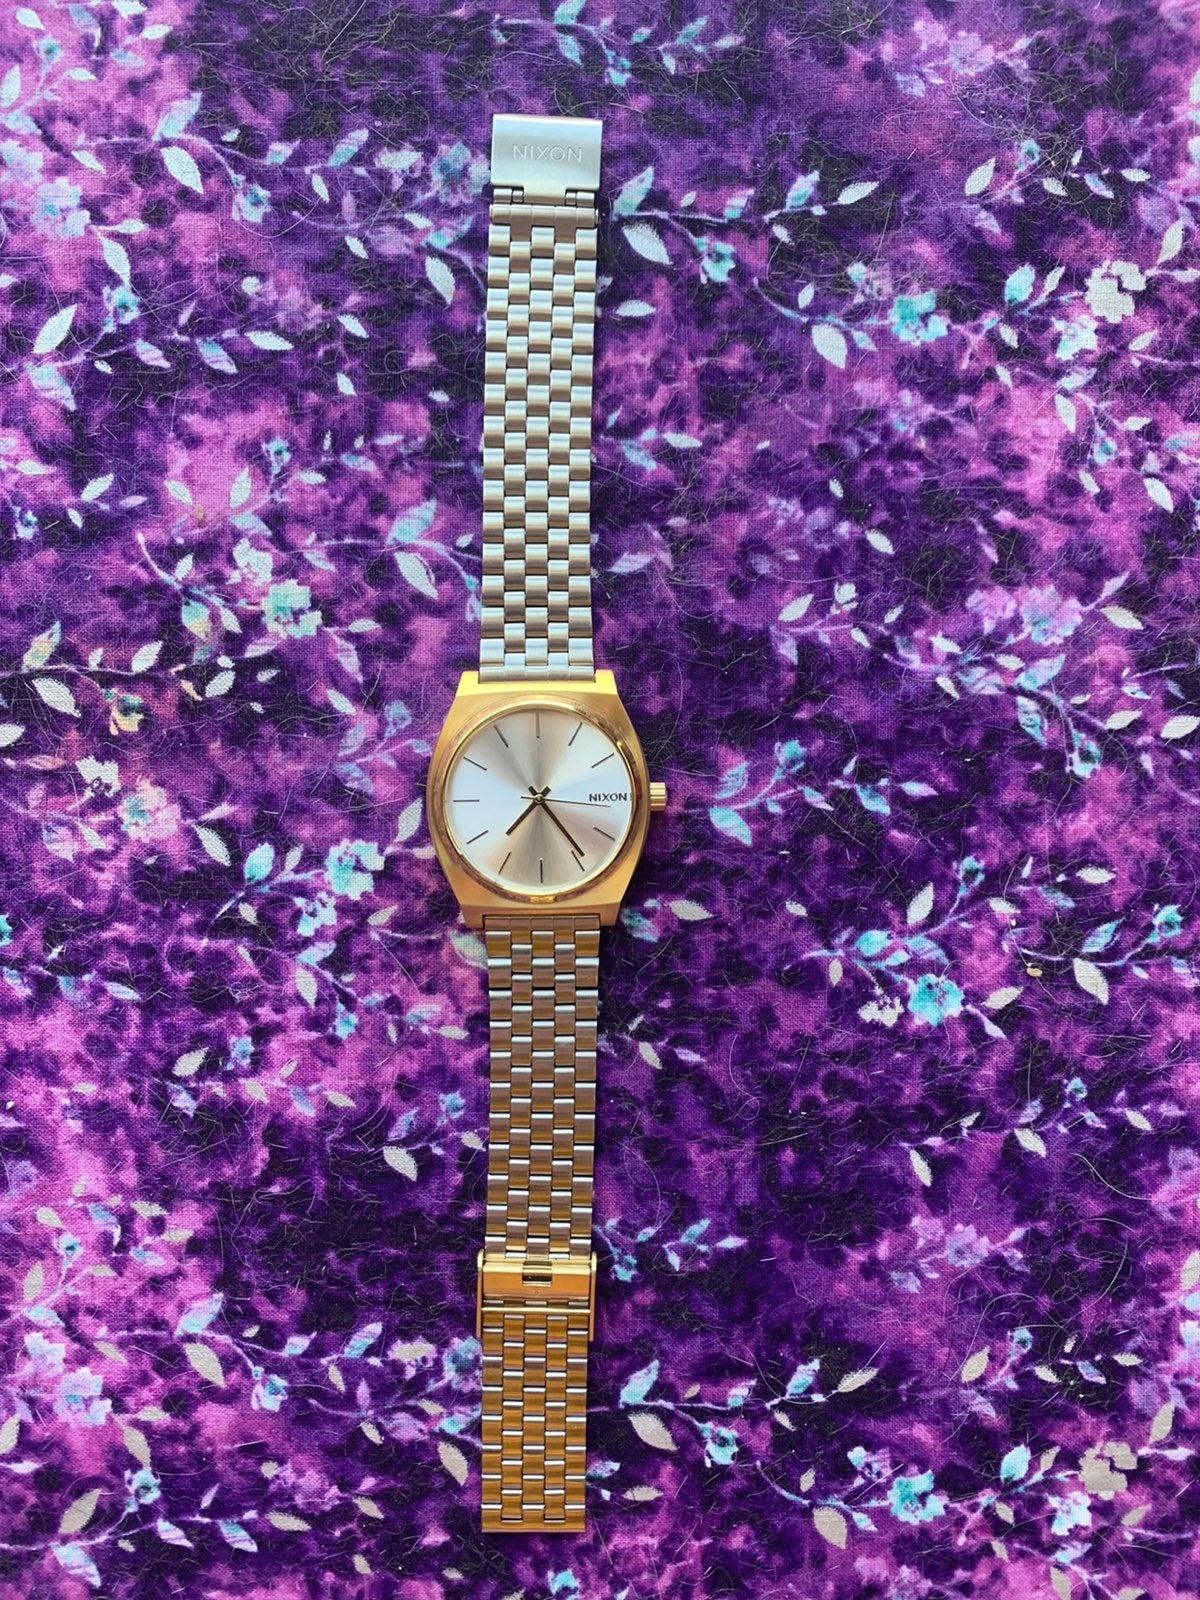 Nixon 18k Gold Platted Watch